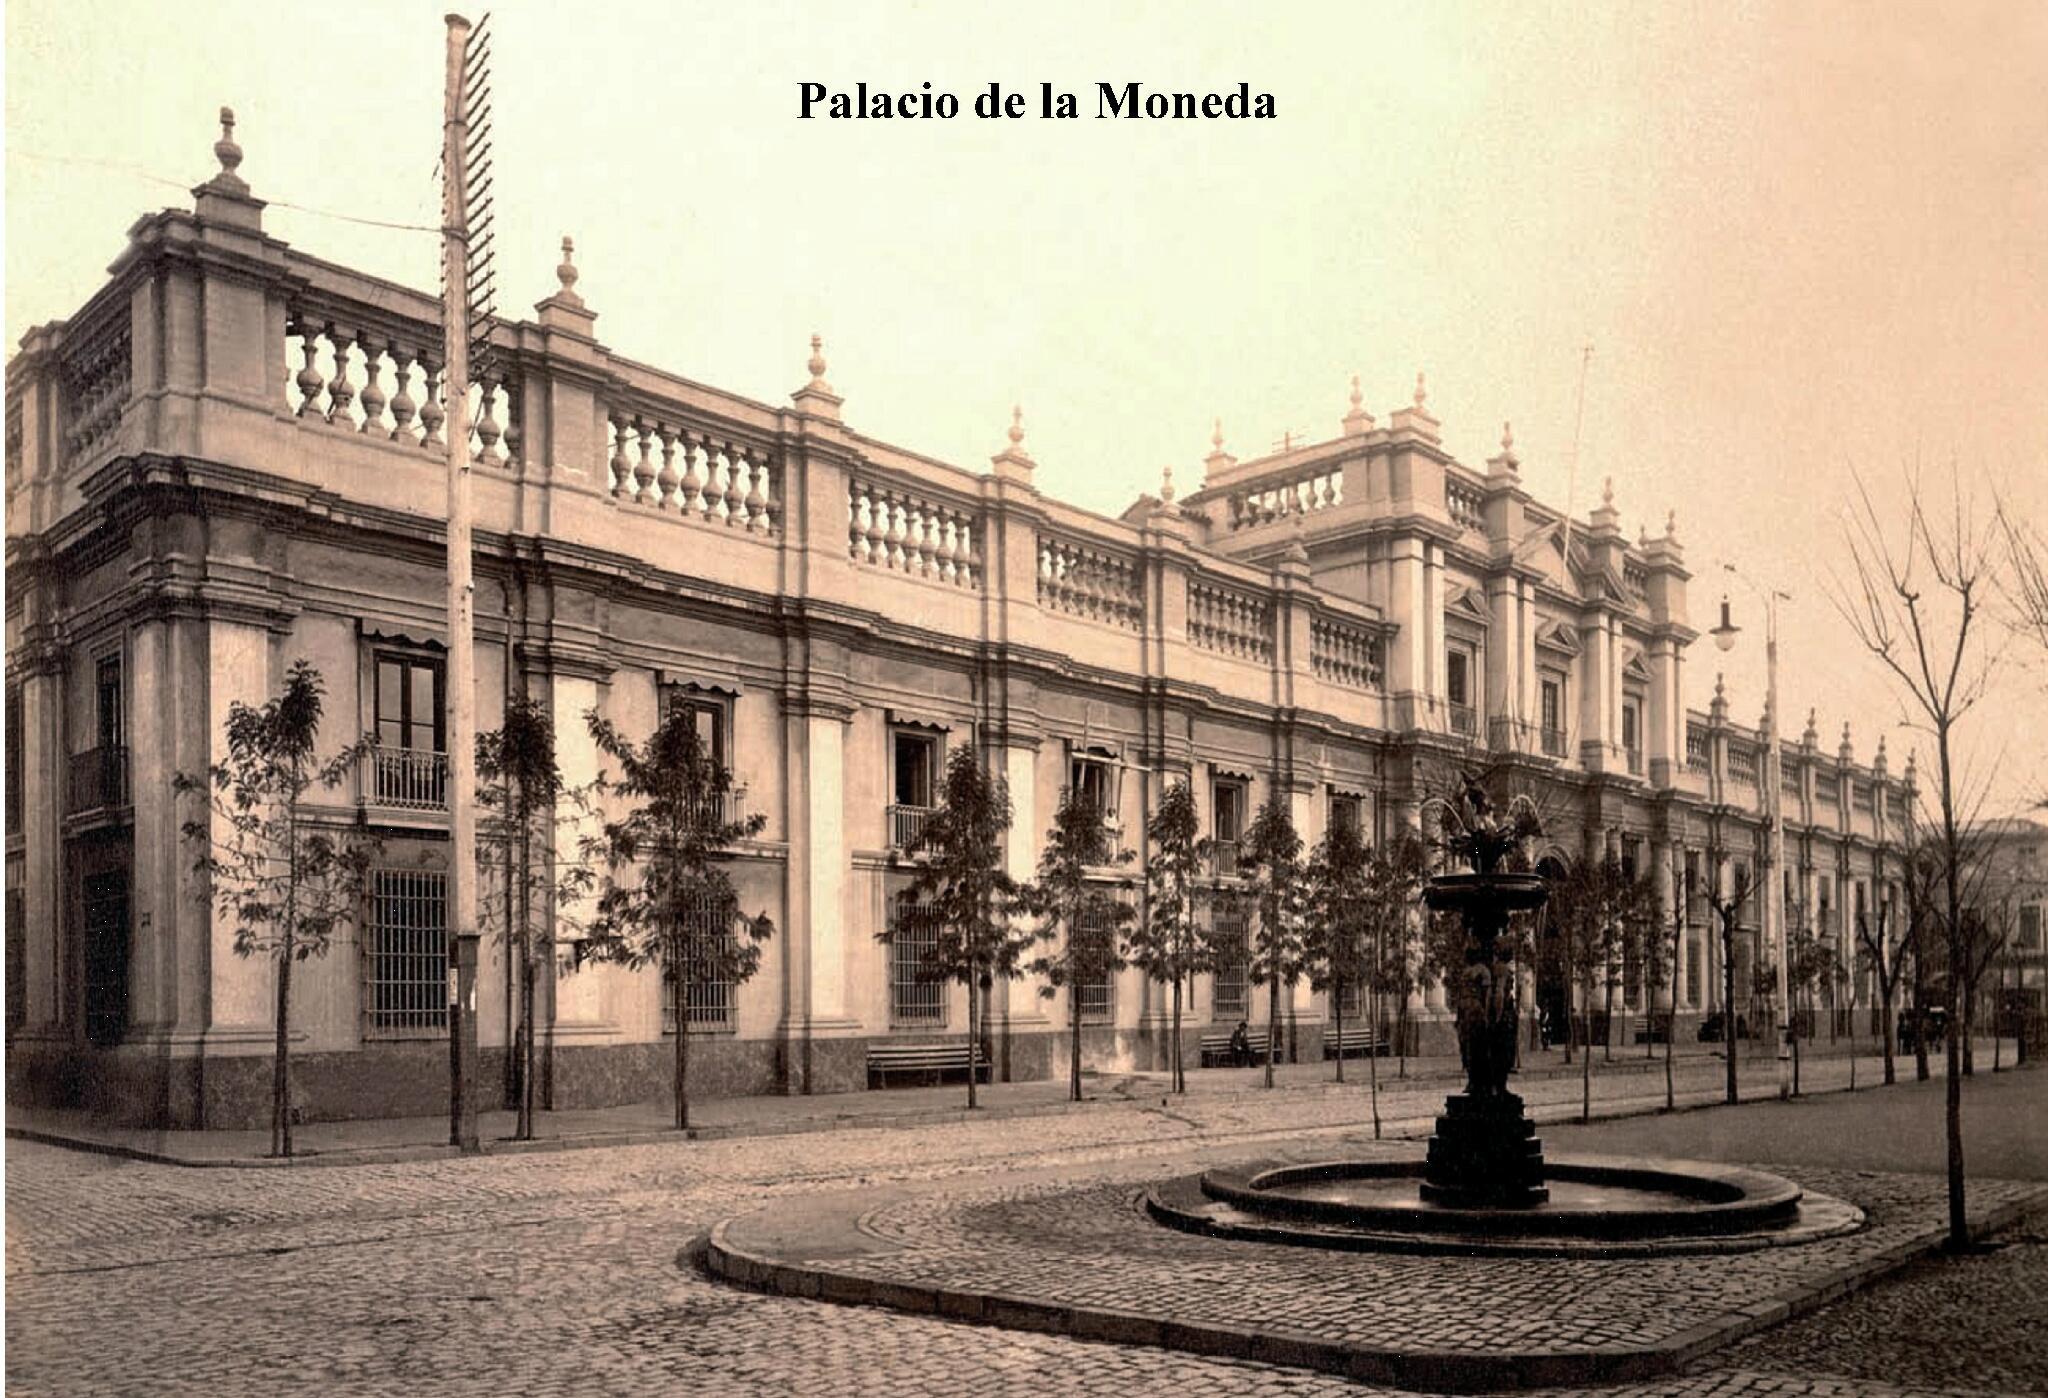 #Santiago Palacio de La Moneda en década de 1920 http://t.co/IVRhGC4tPu